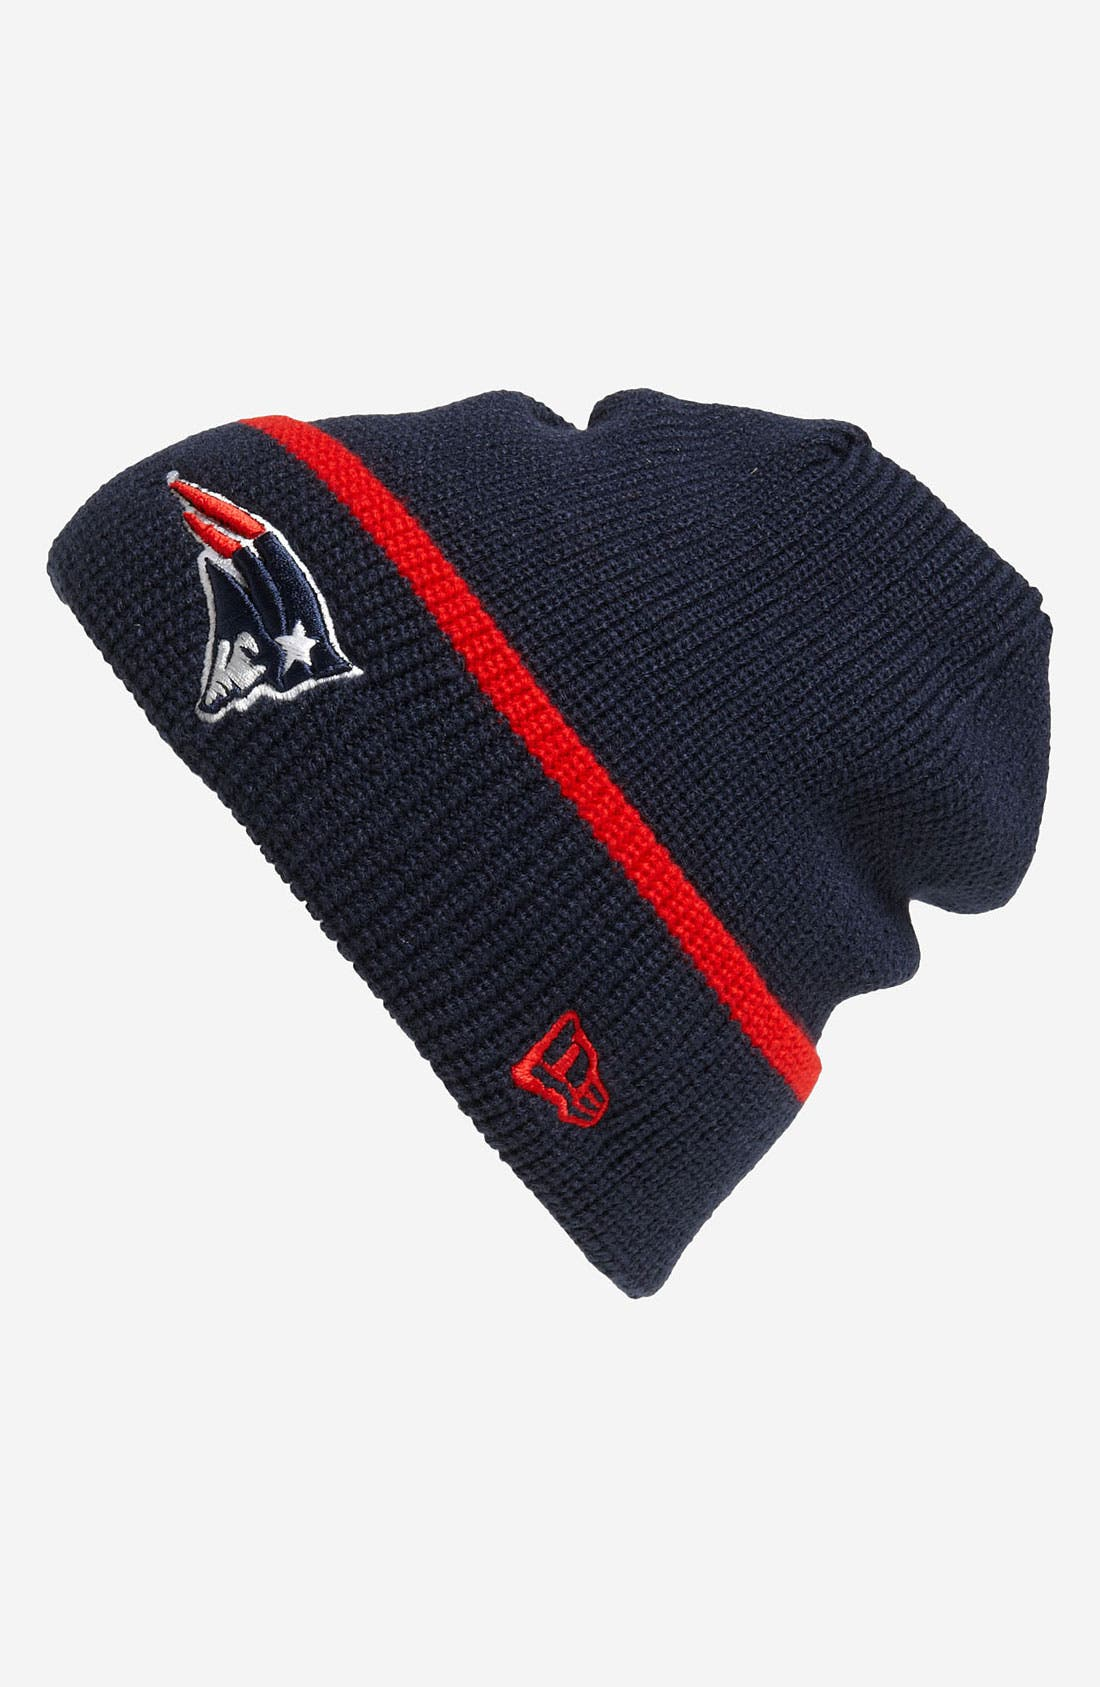 Alternate Image 1 Selected - New Era Cap 'New England Patriots' Pop-Cuff Knit Beanie